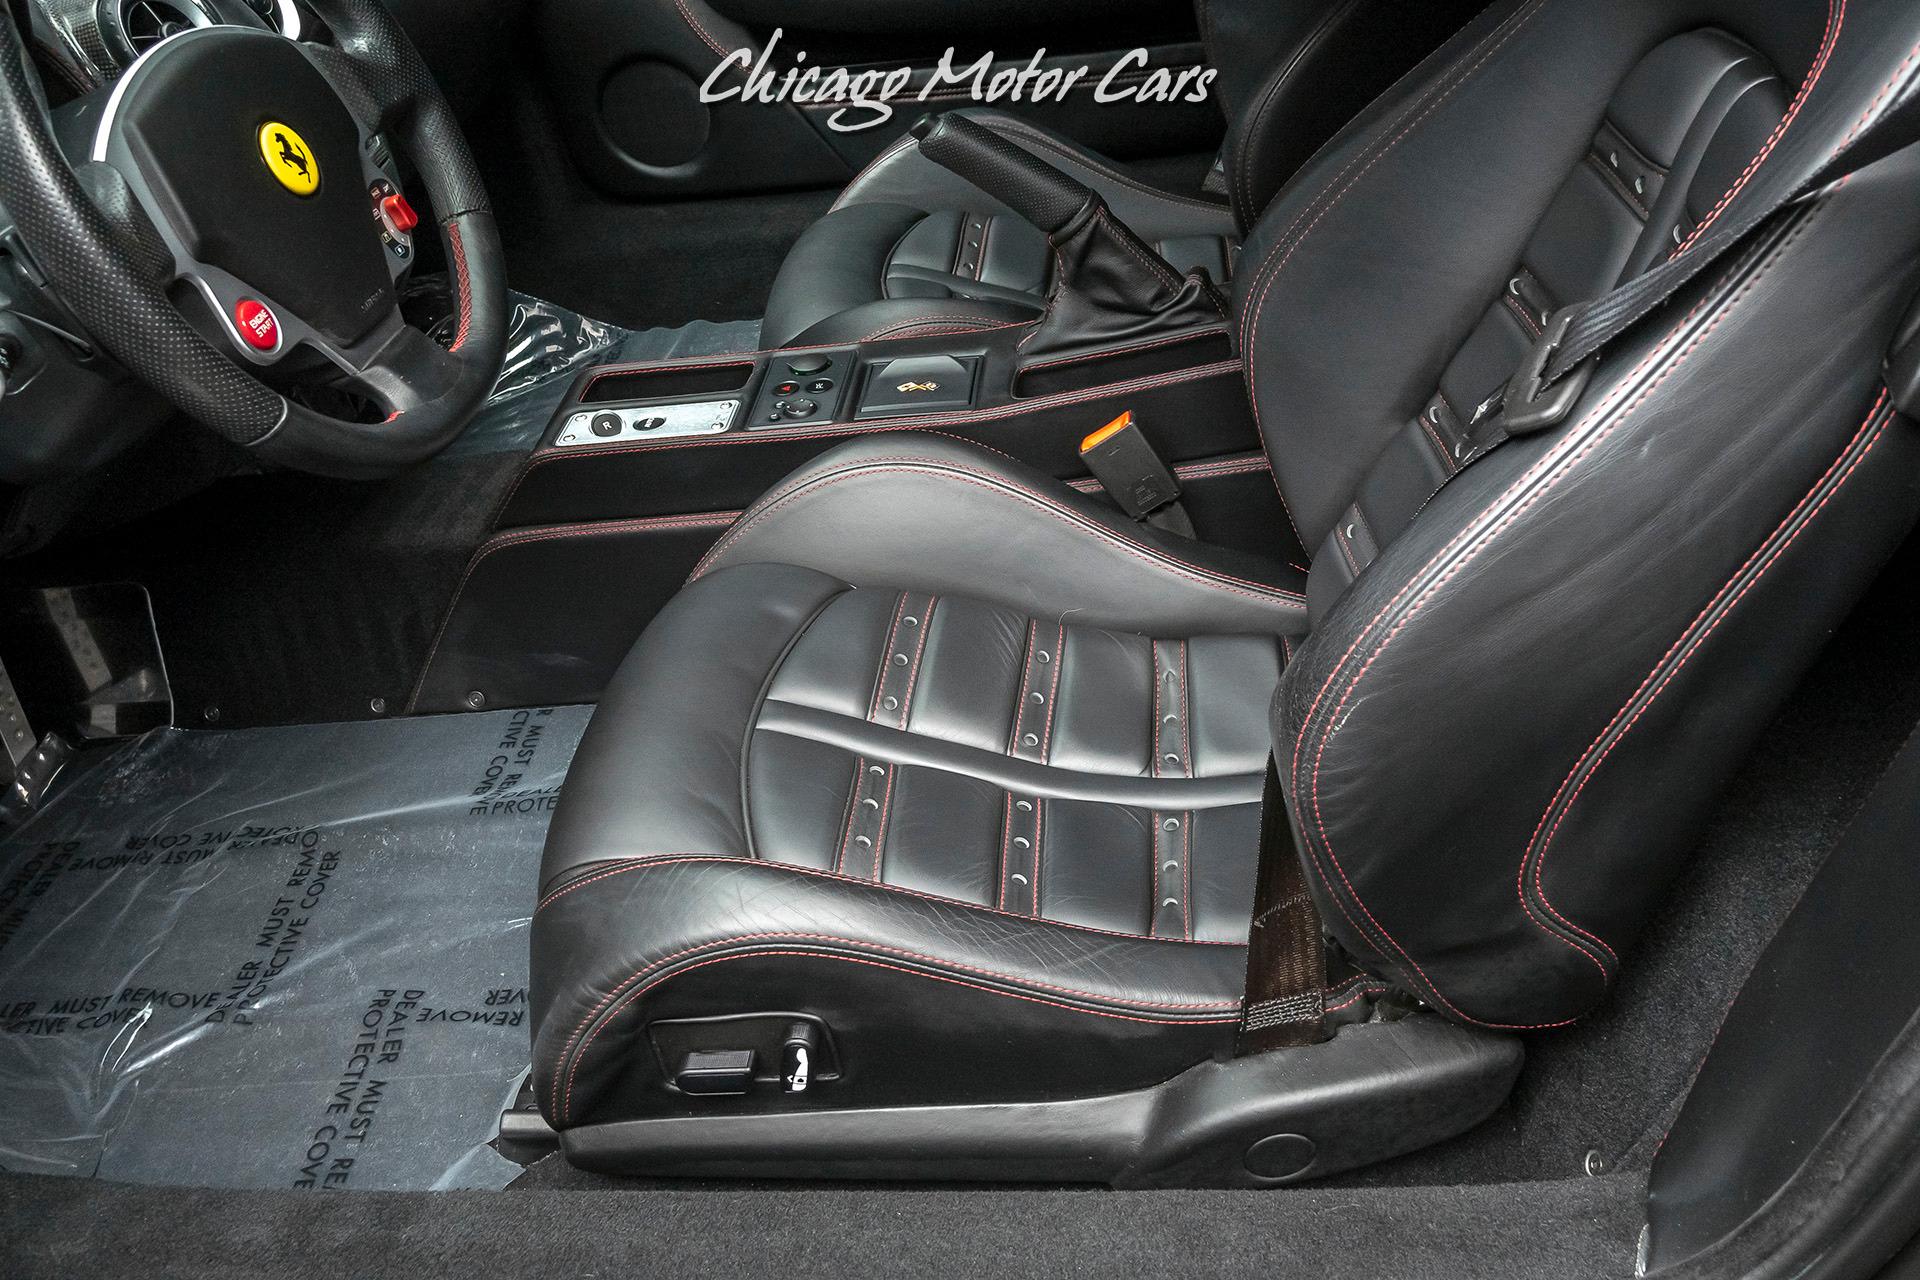 Used-2007-Ferrari-F430-F1-Coupe---Only-8K-Miles---Daytonas---HI-Fi-Sound